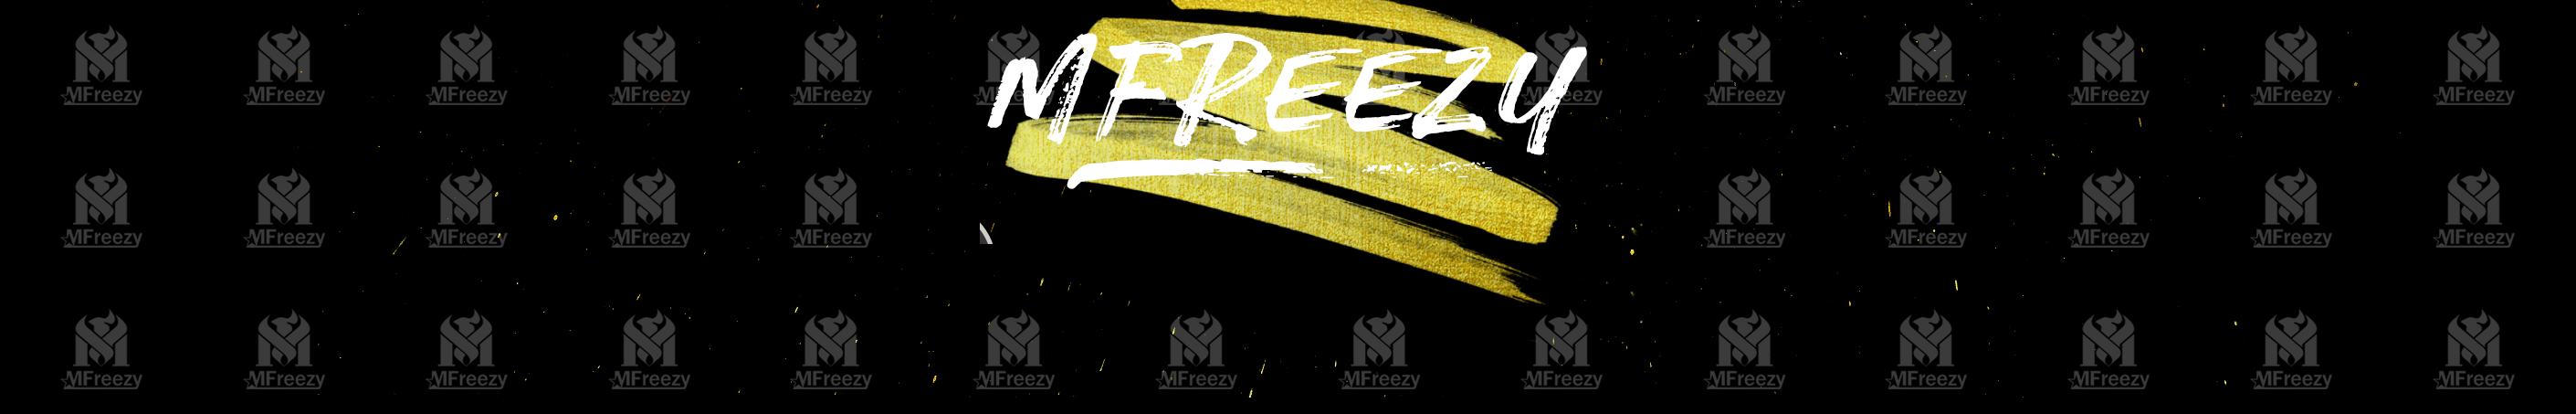 MFreezy蒙古说唱网 banner